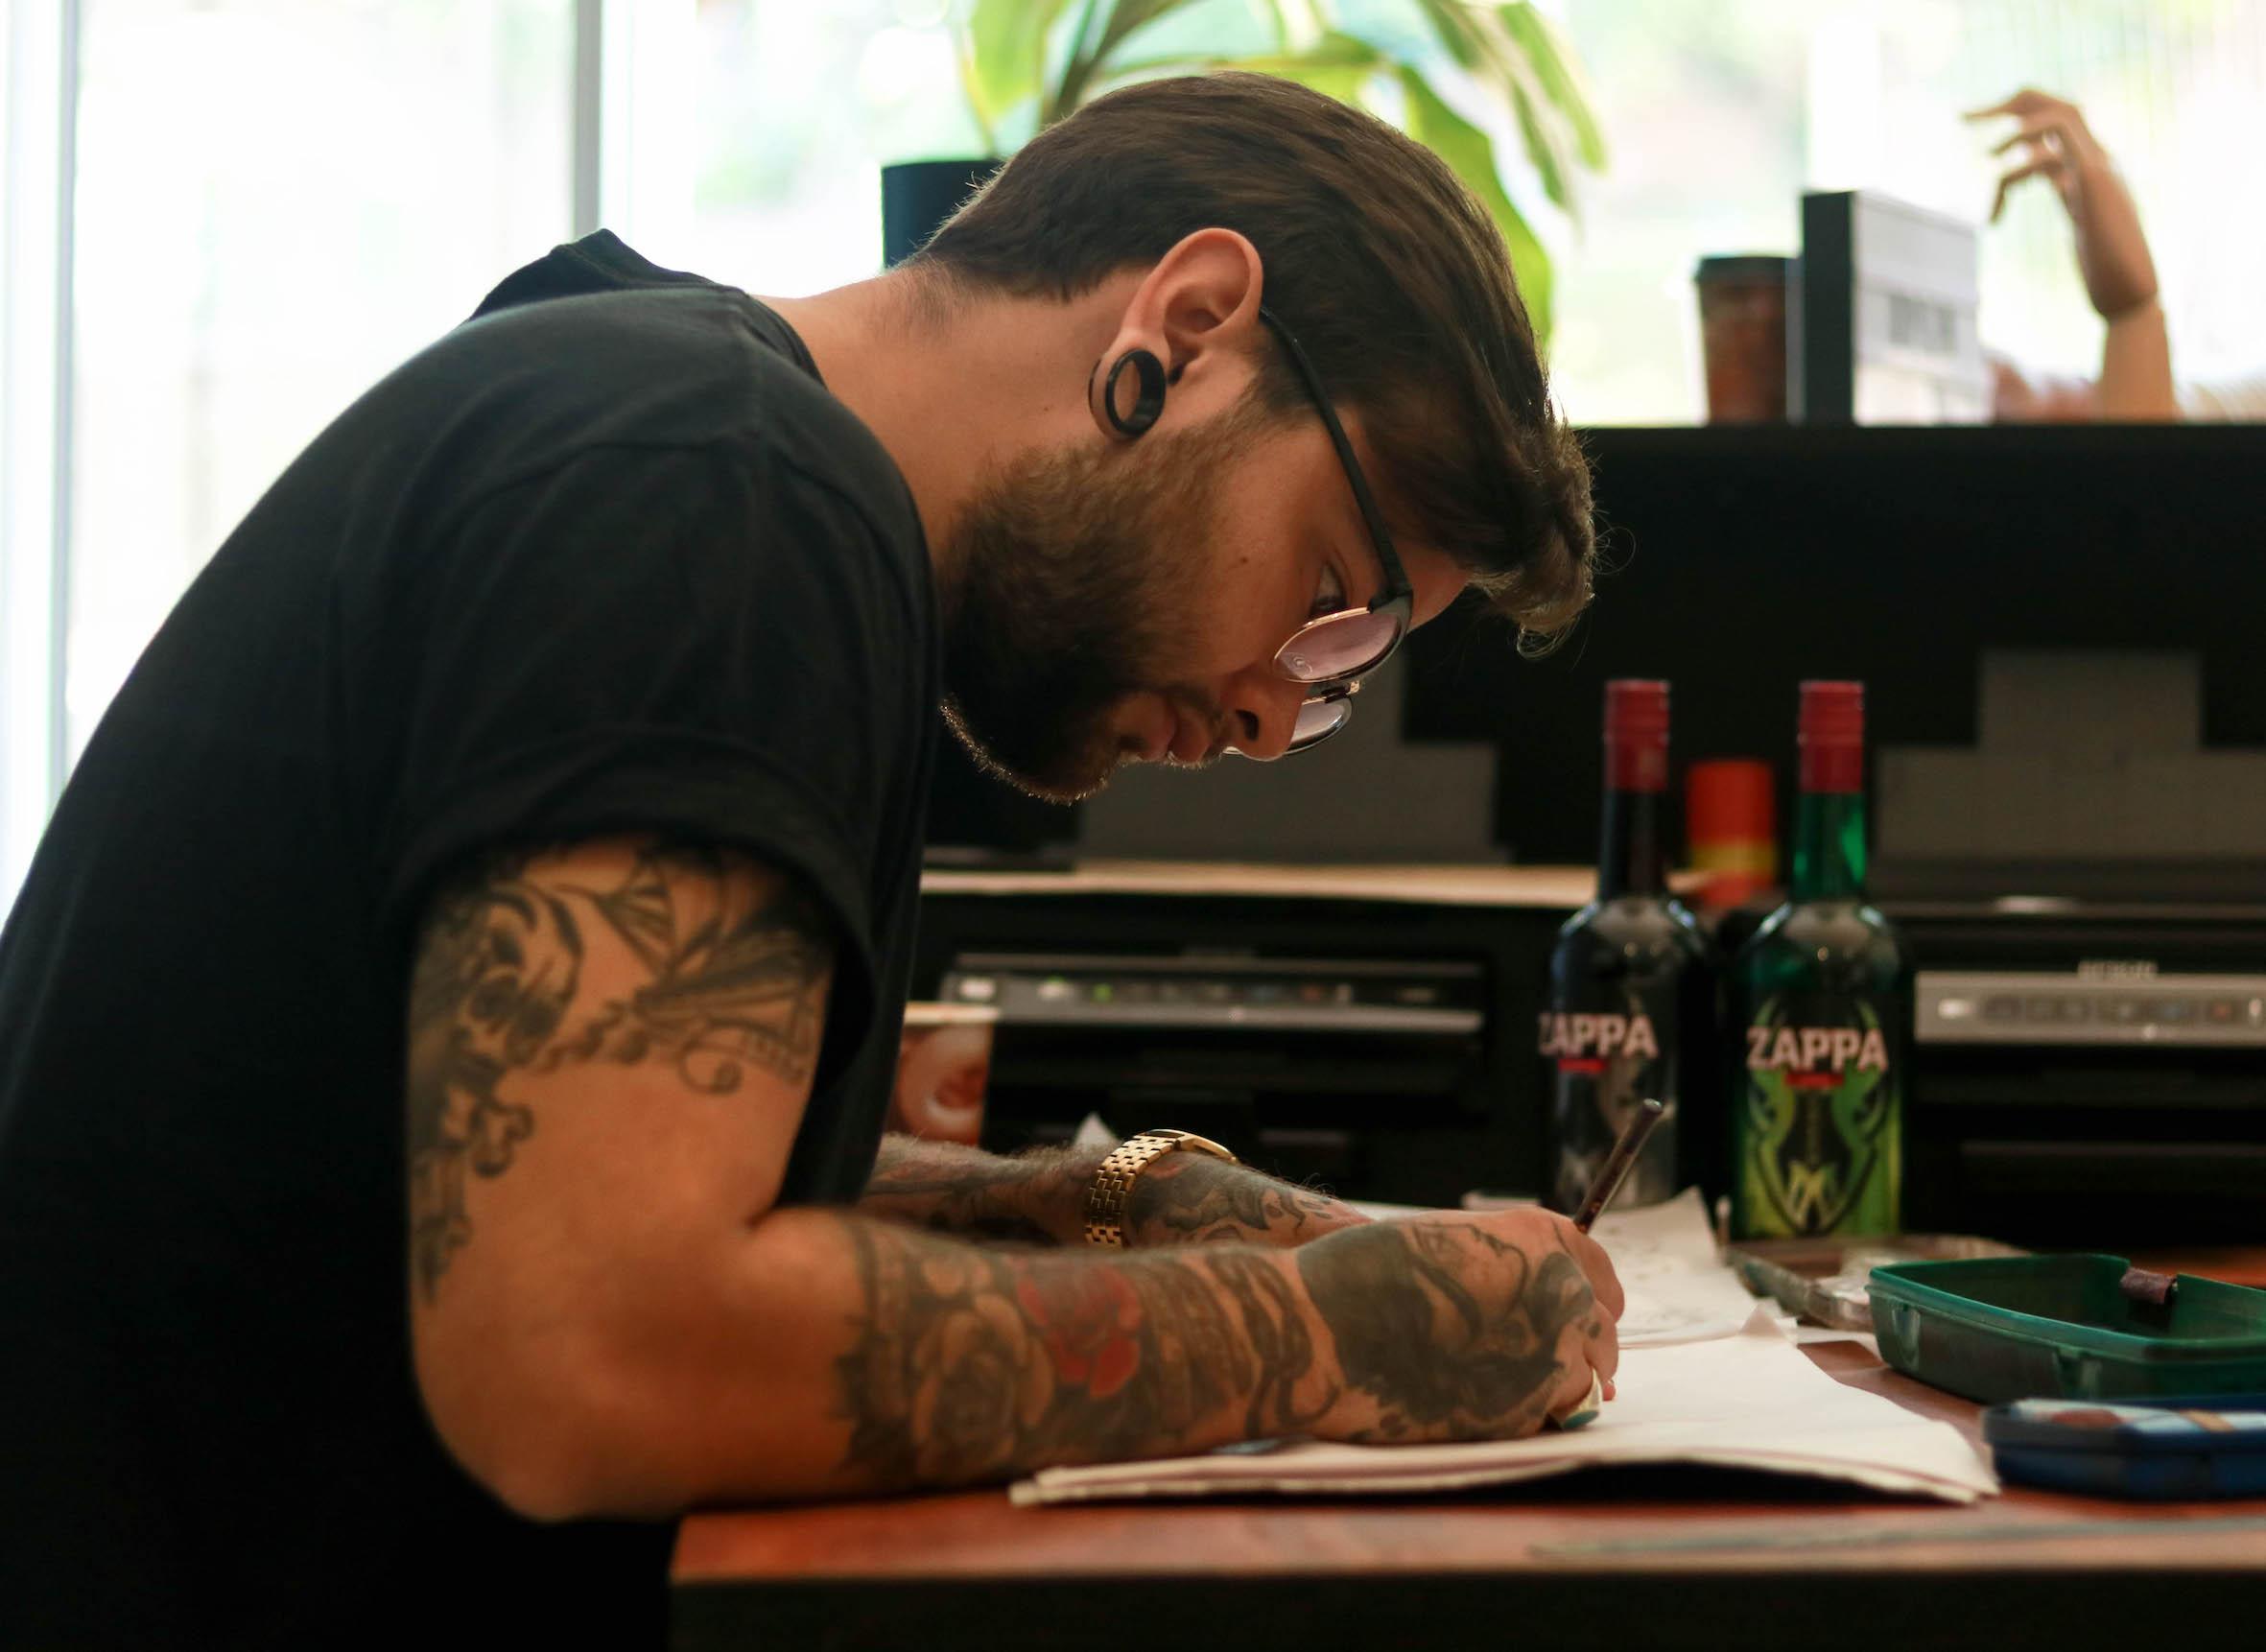 Tattoo Artist, Mason Murdey designs a tattoo for a client